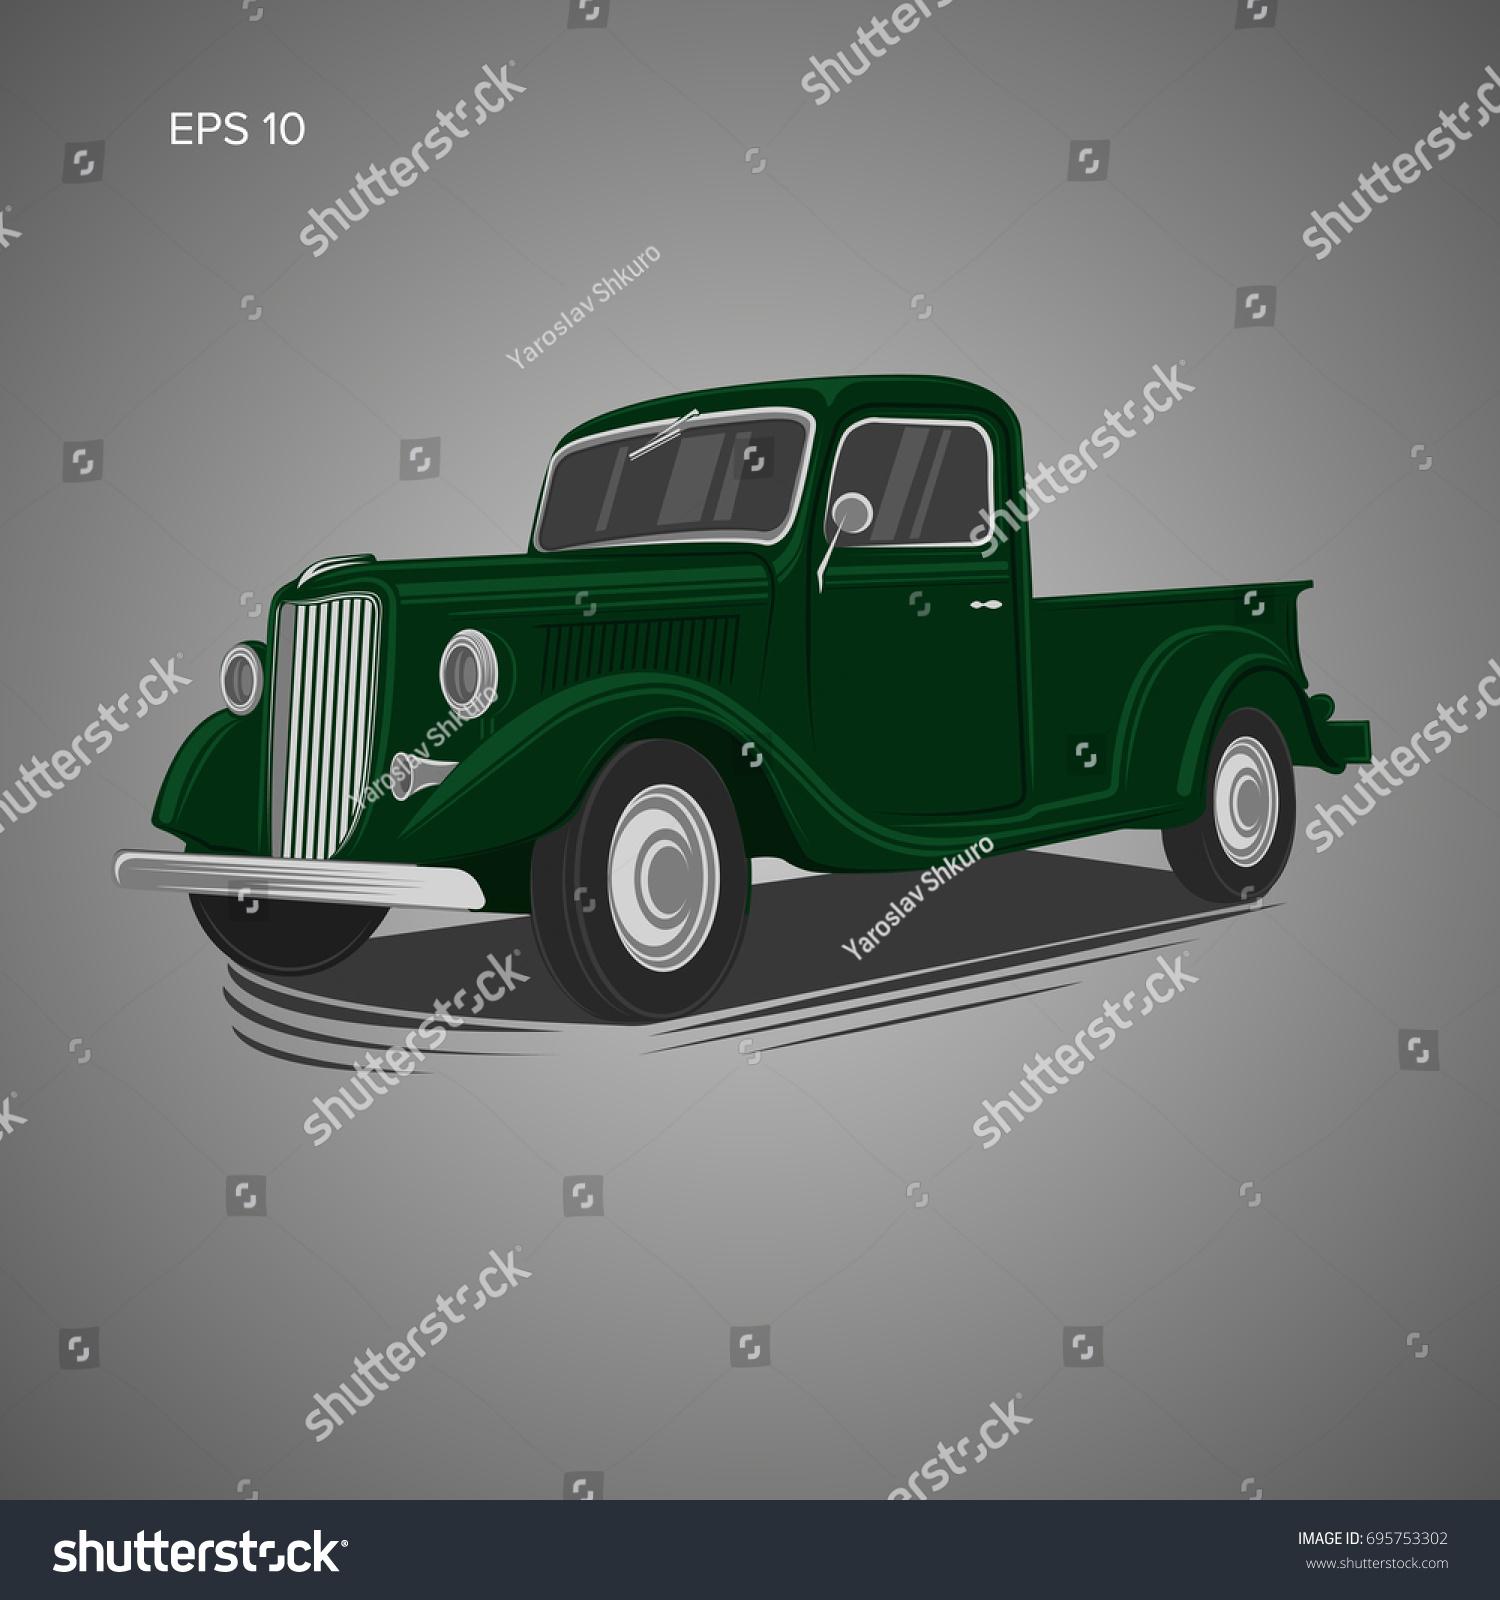 Old Retro Pickup Truck Vector Illustration Stock Vector 695753302 ...